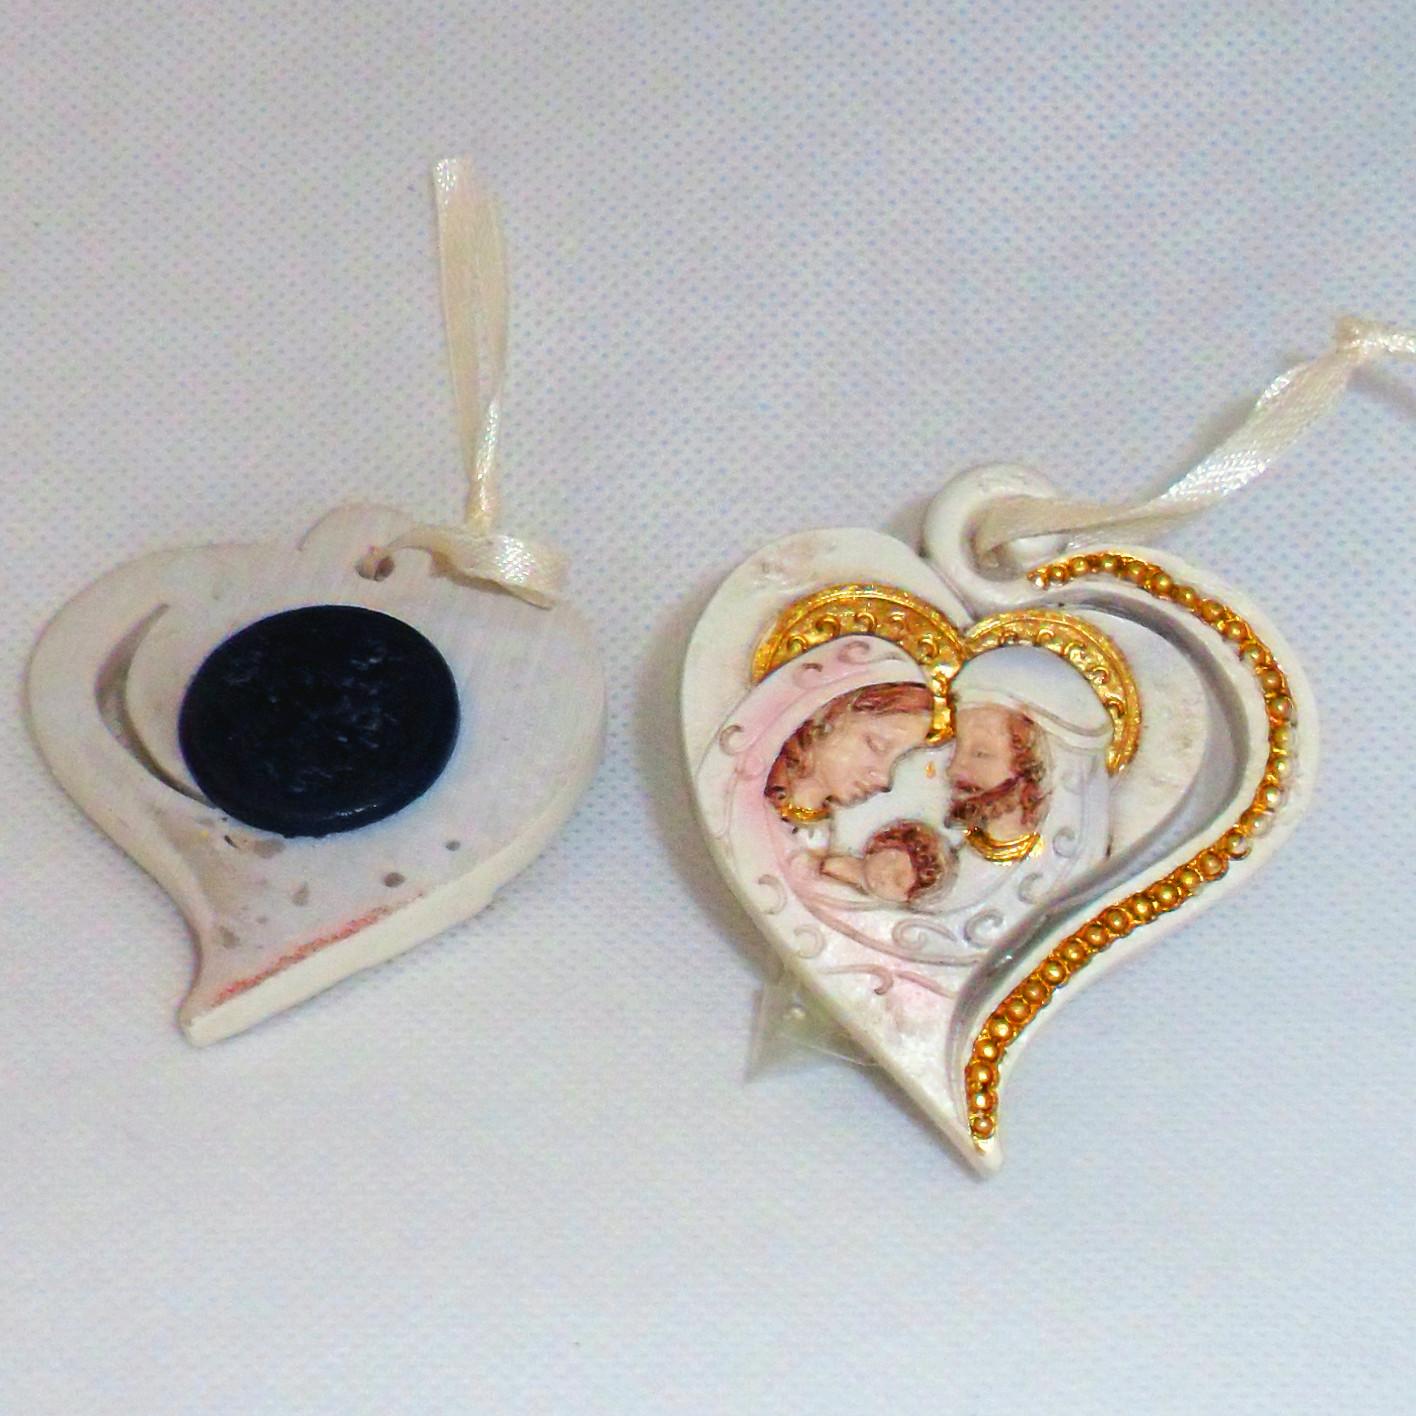 Calamita cuore icona sacra famiglia bambino